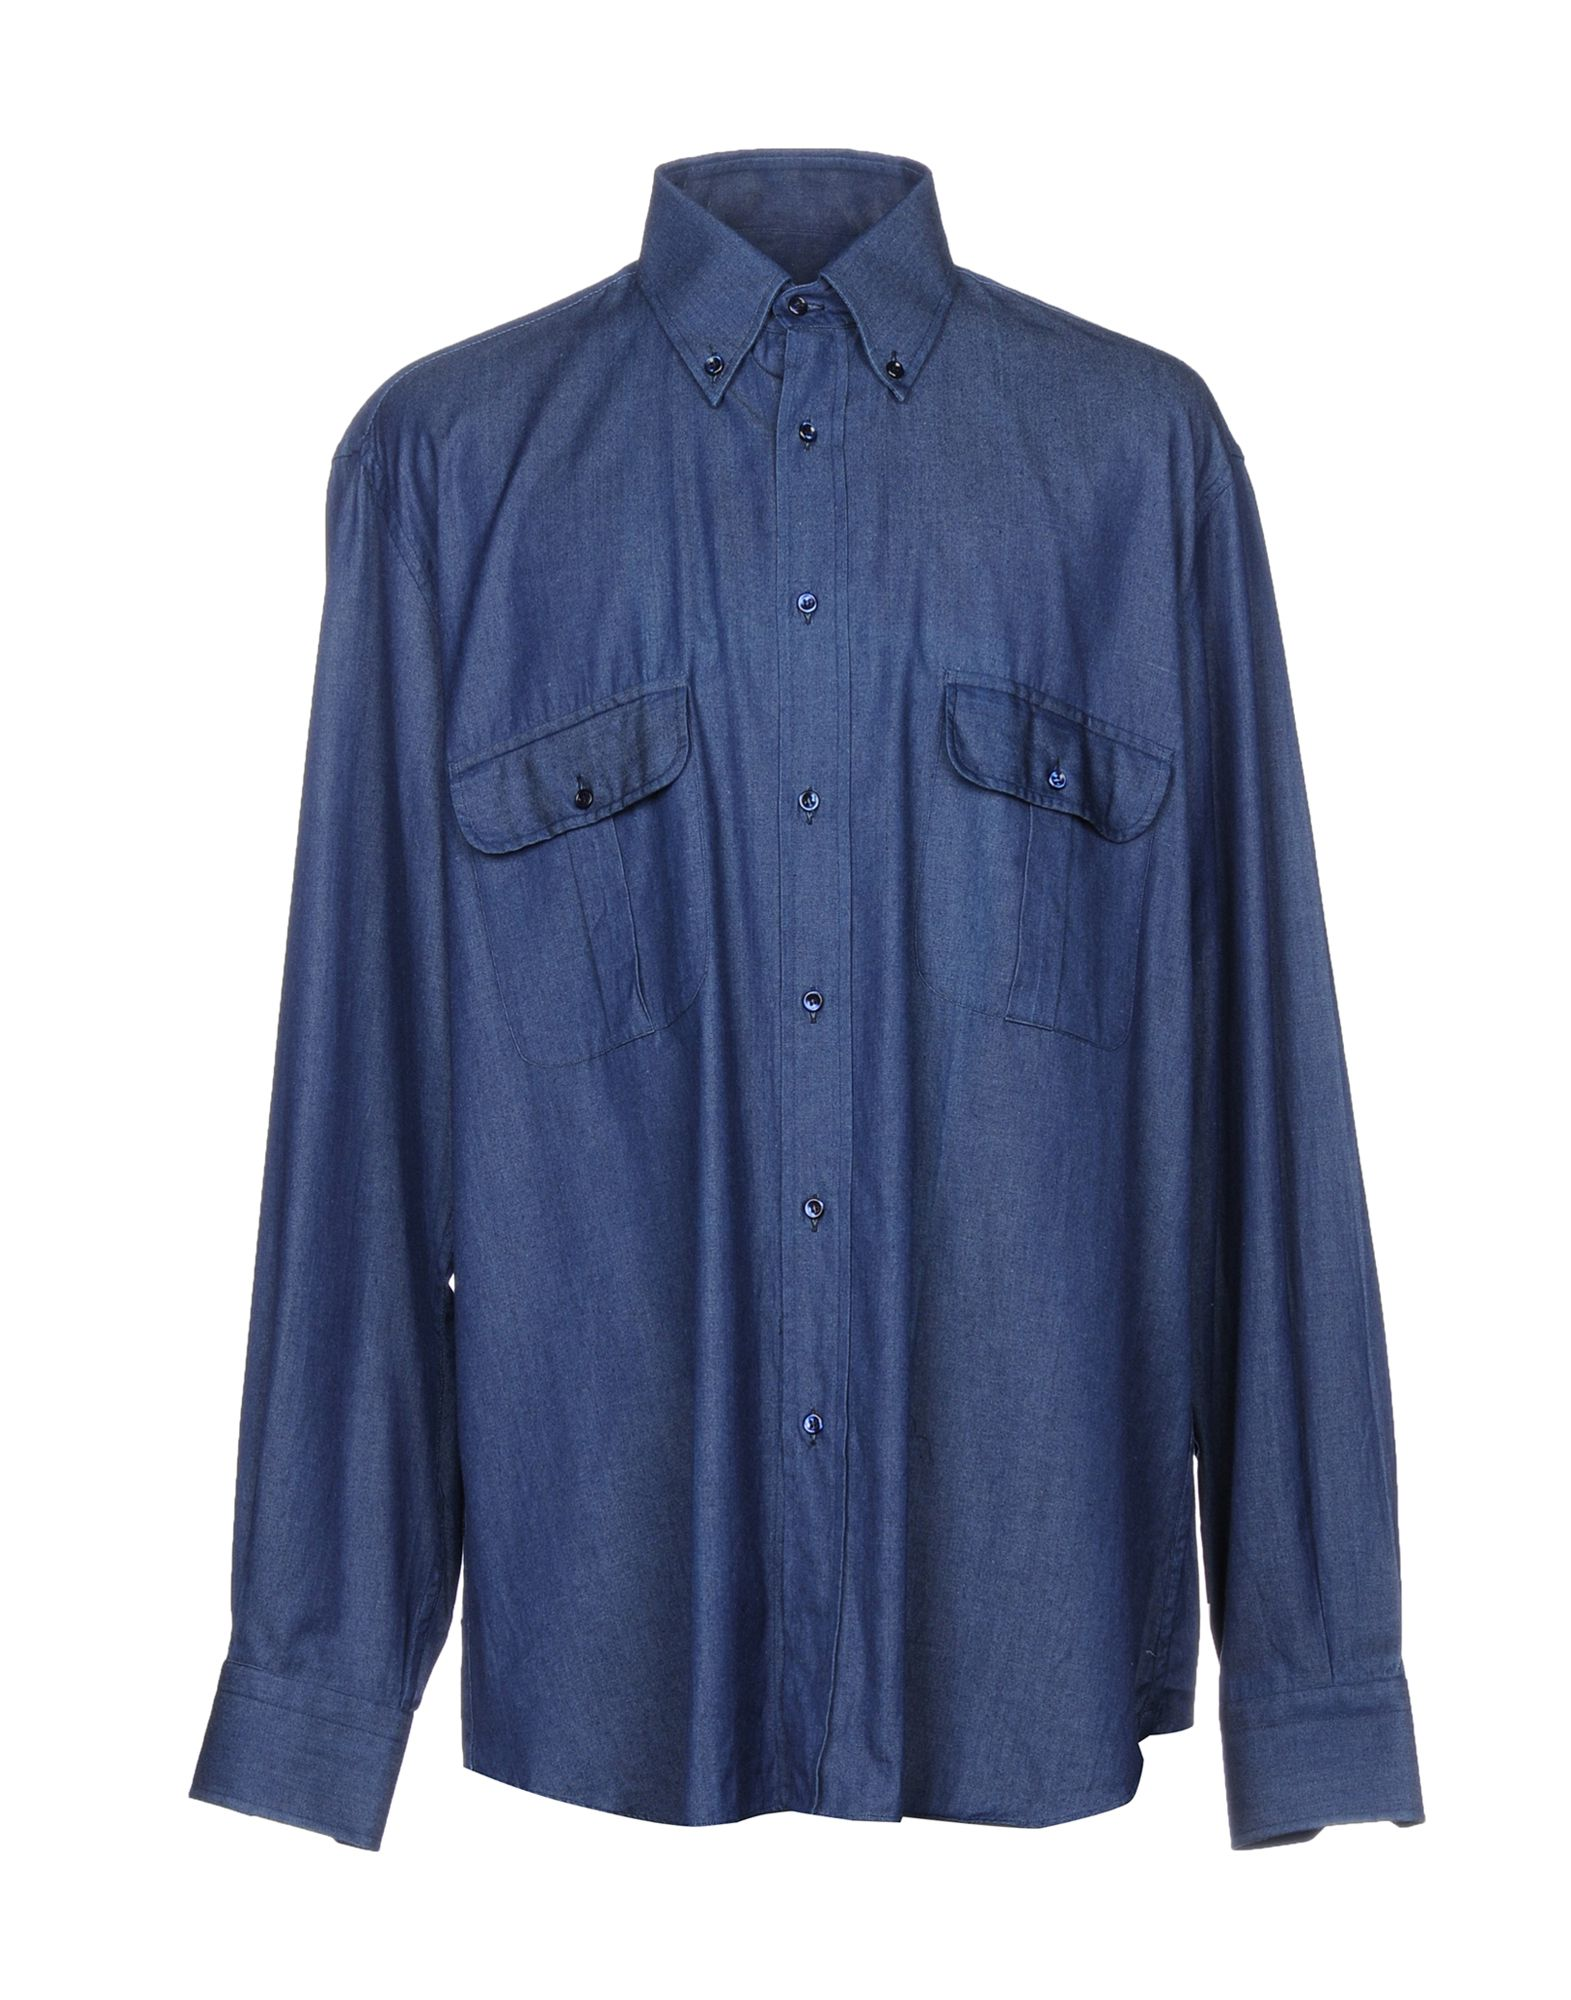 GIANMARCO BONAGA Джинсовая рубашка closed бермуды